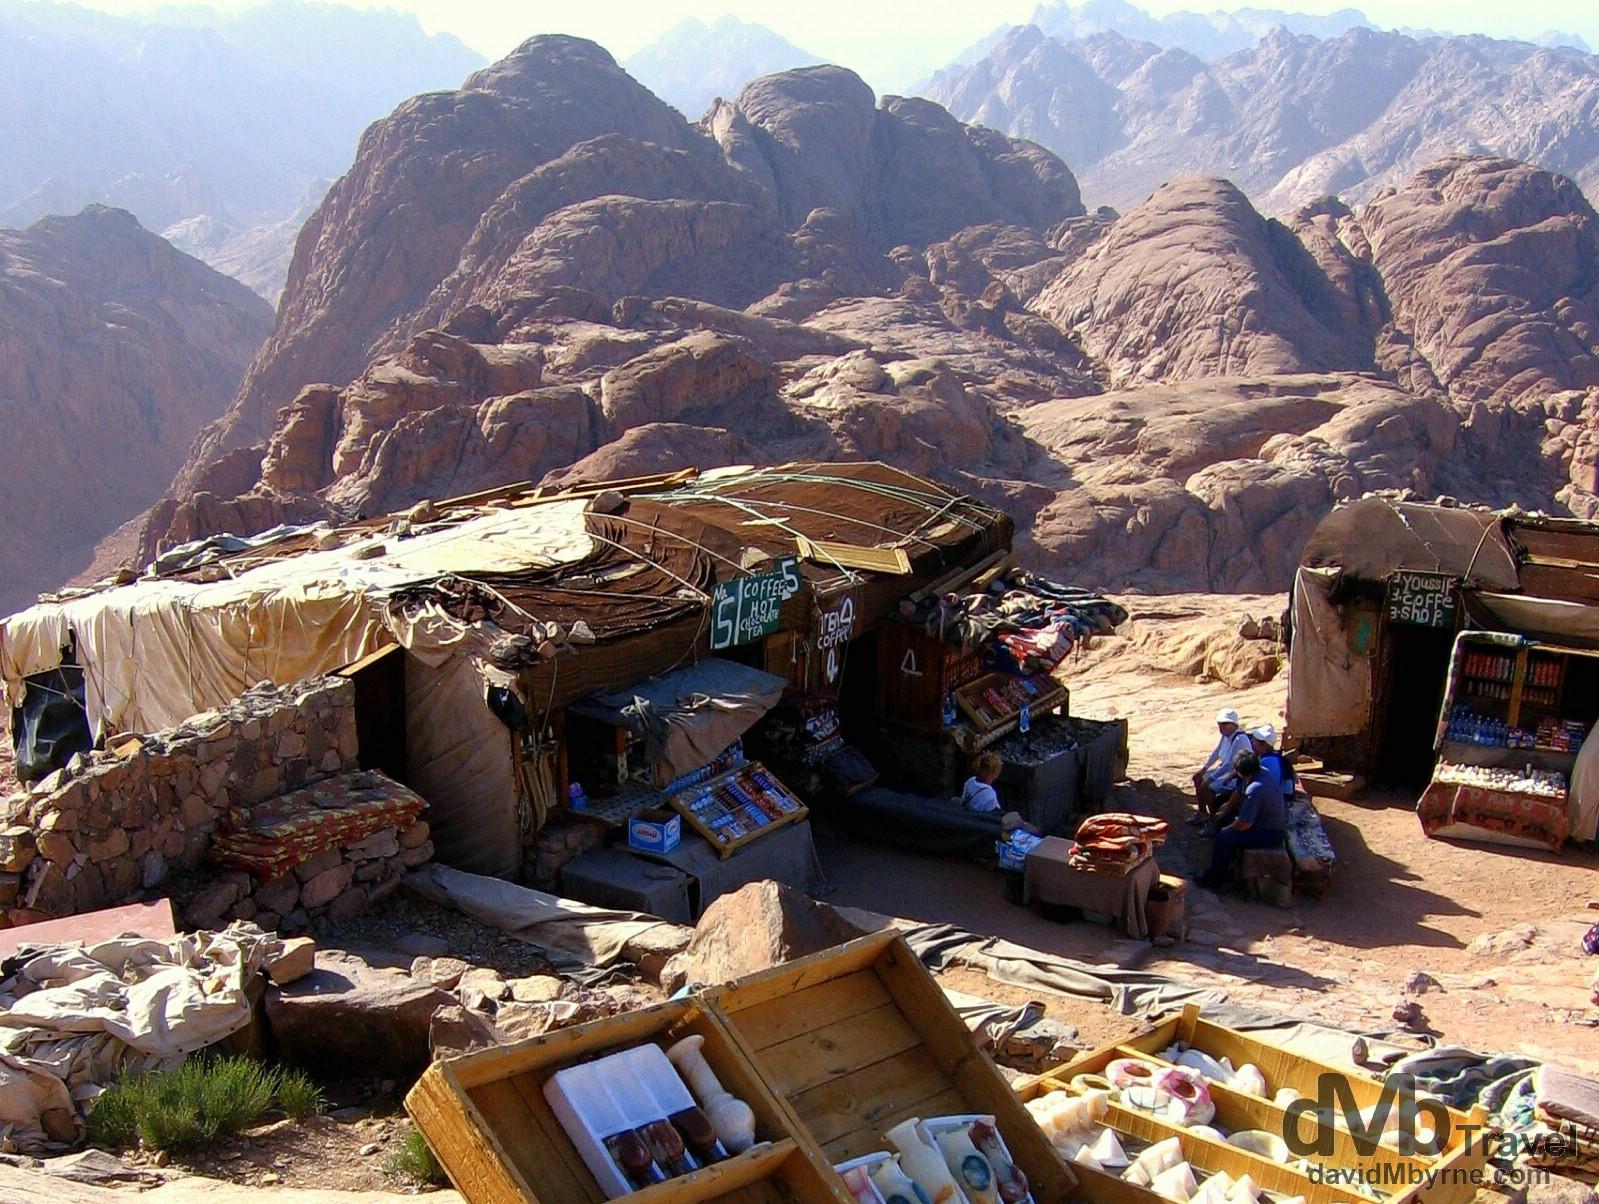 The summit of Mt. Sinai, Sinai Peninsula, Egypt. April 22, 2008.